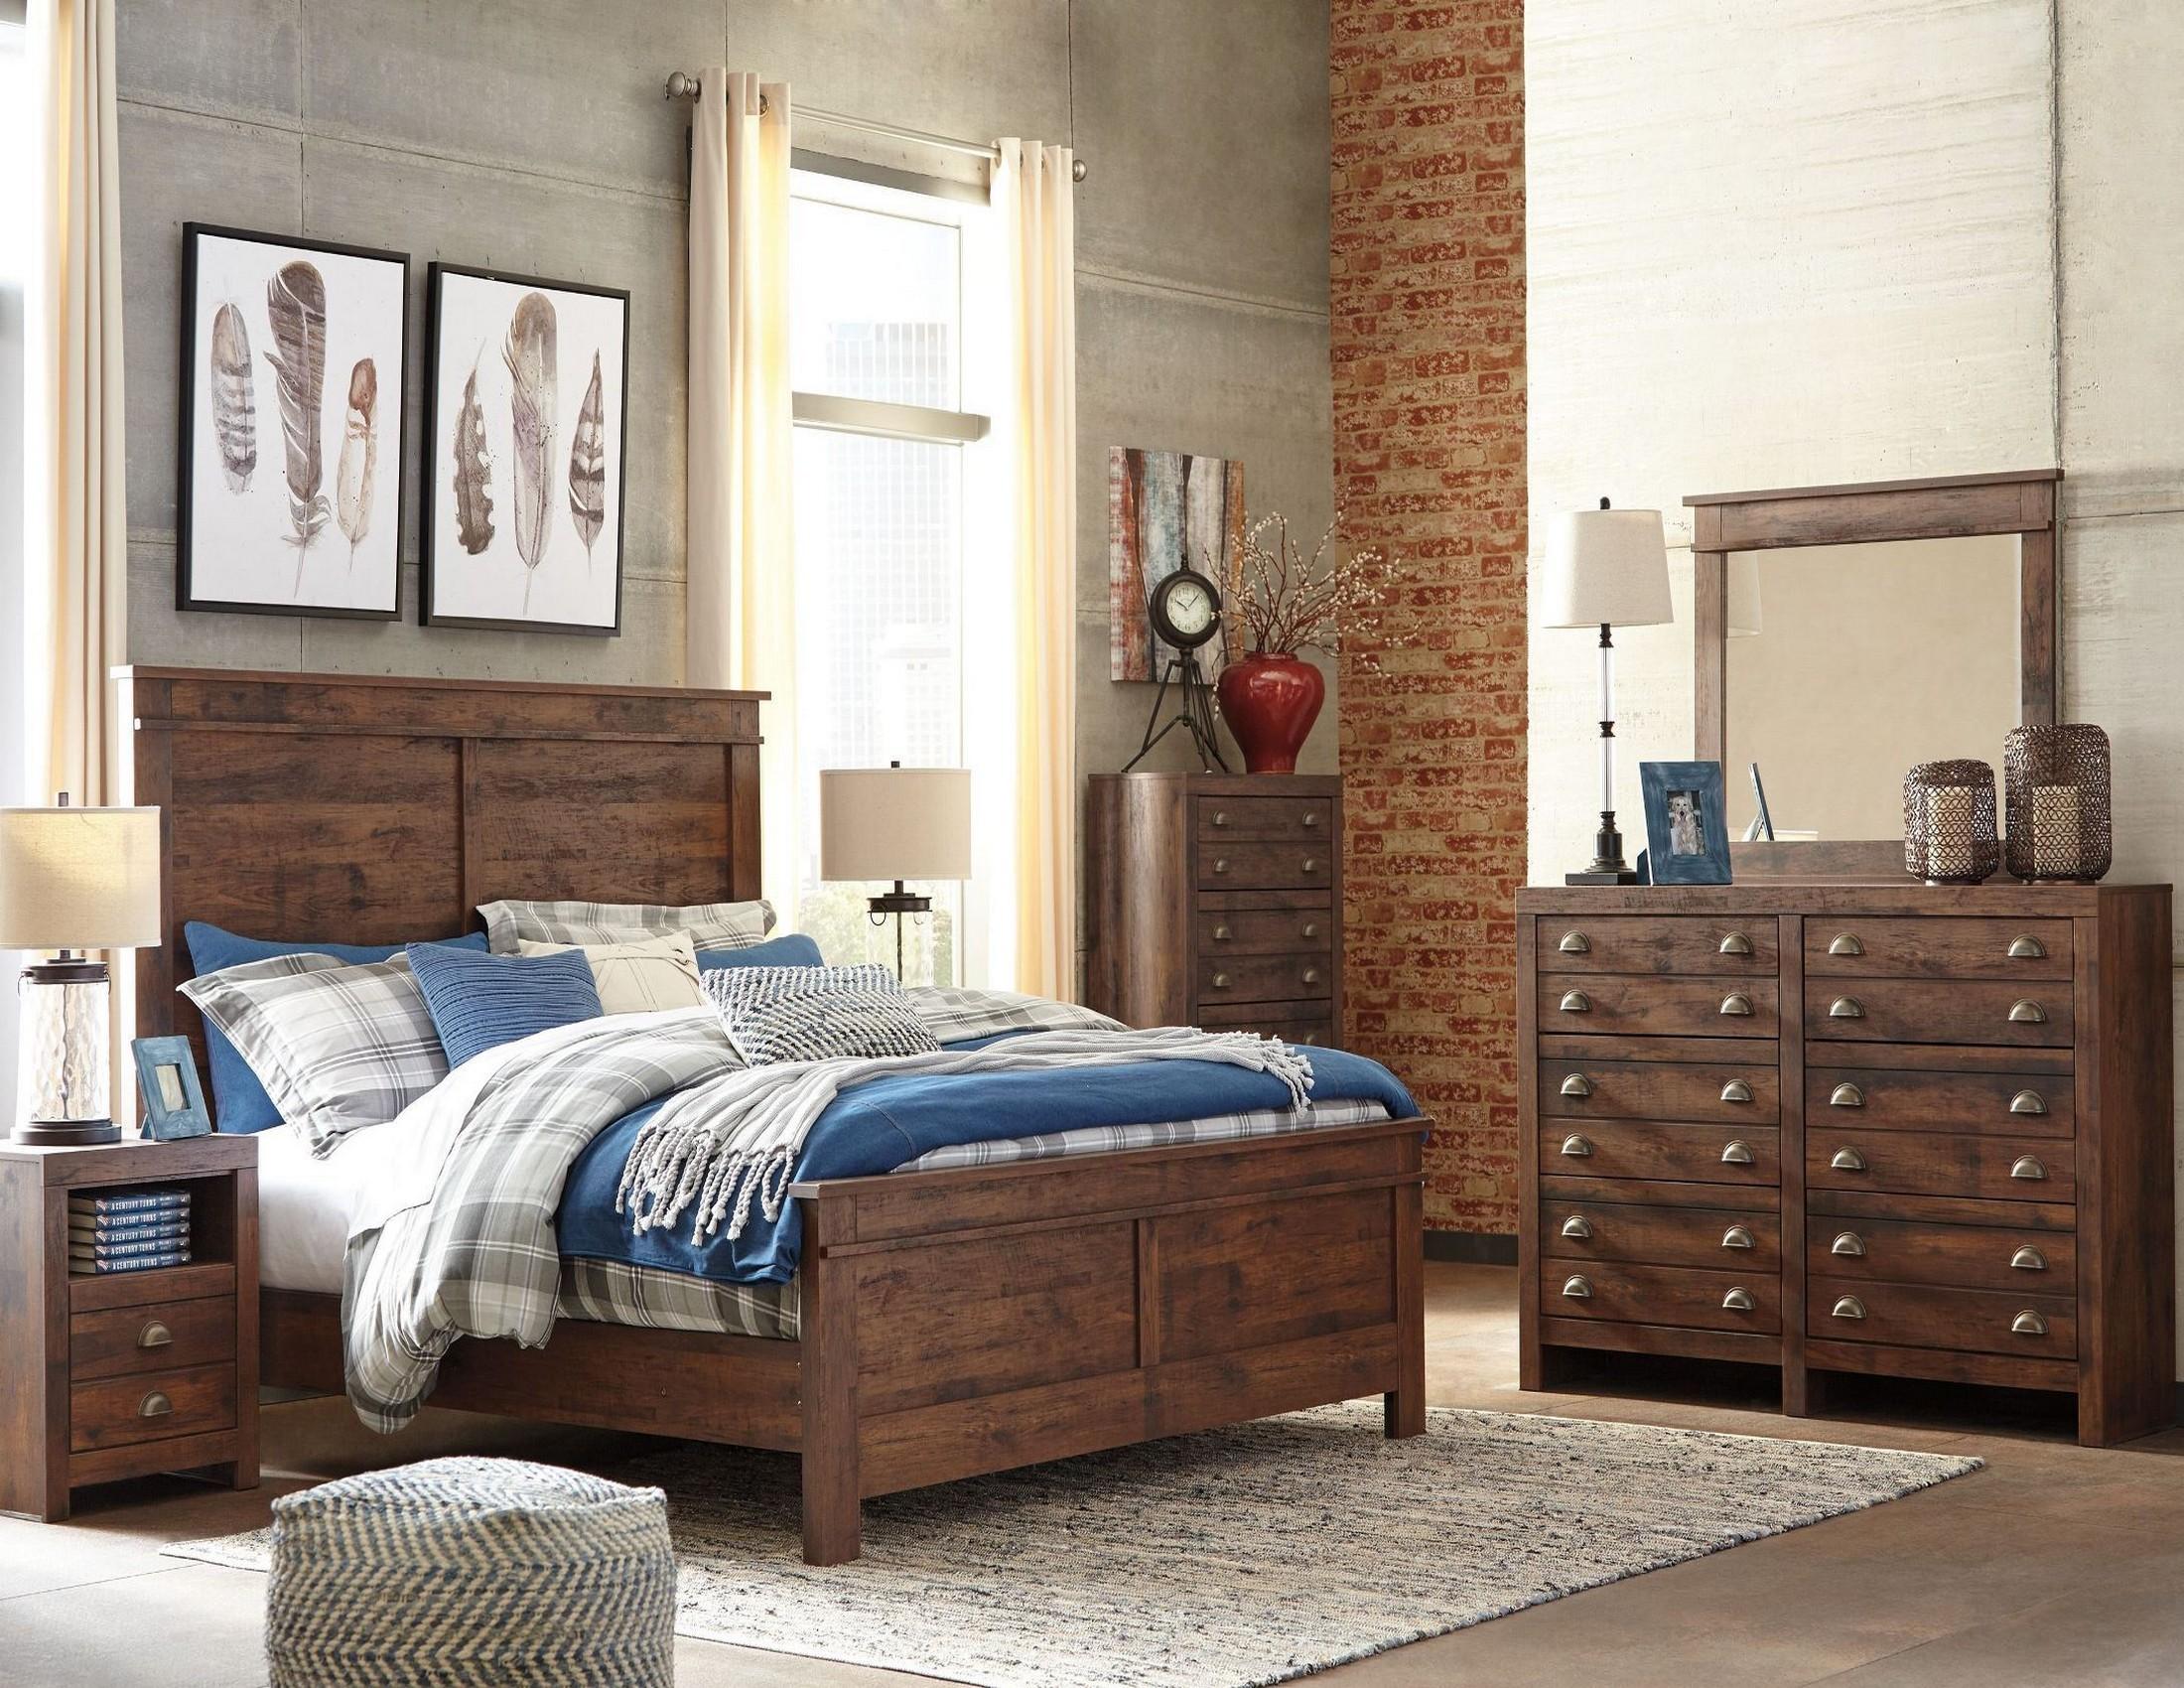 hammerstead brown panel bedroom set from ashley | coleman furniture